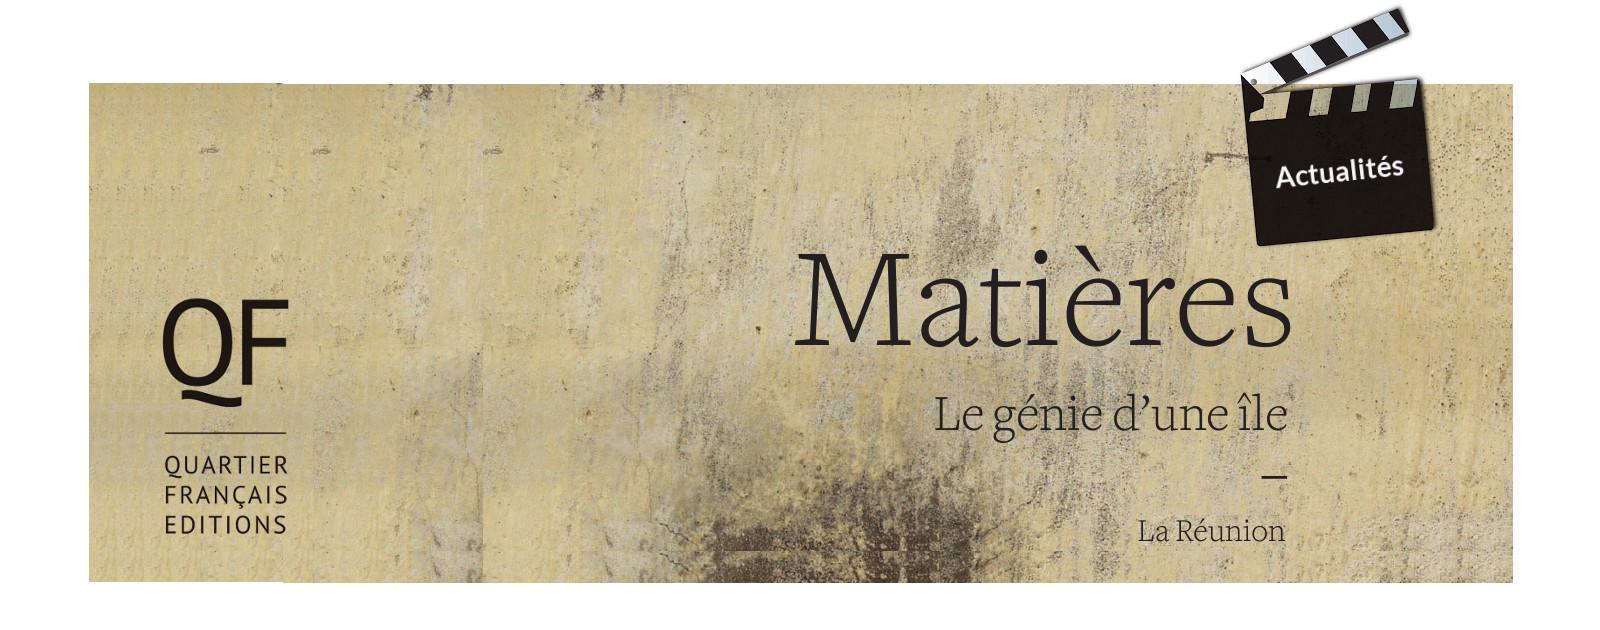 <a href='http://www.netalinea.fr/premiere/matieres-le-genie-dune-ile/'></a>